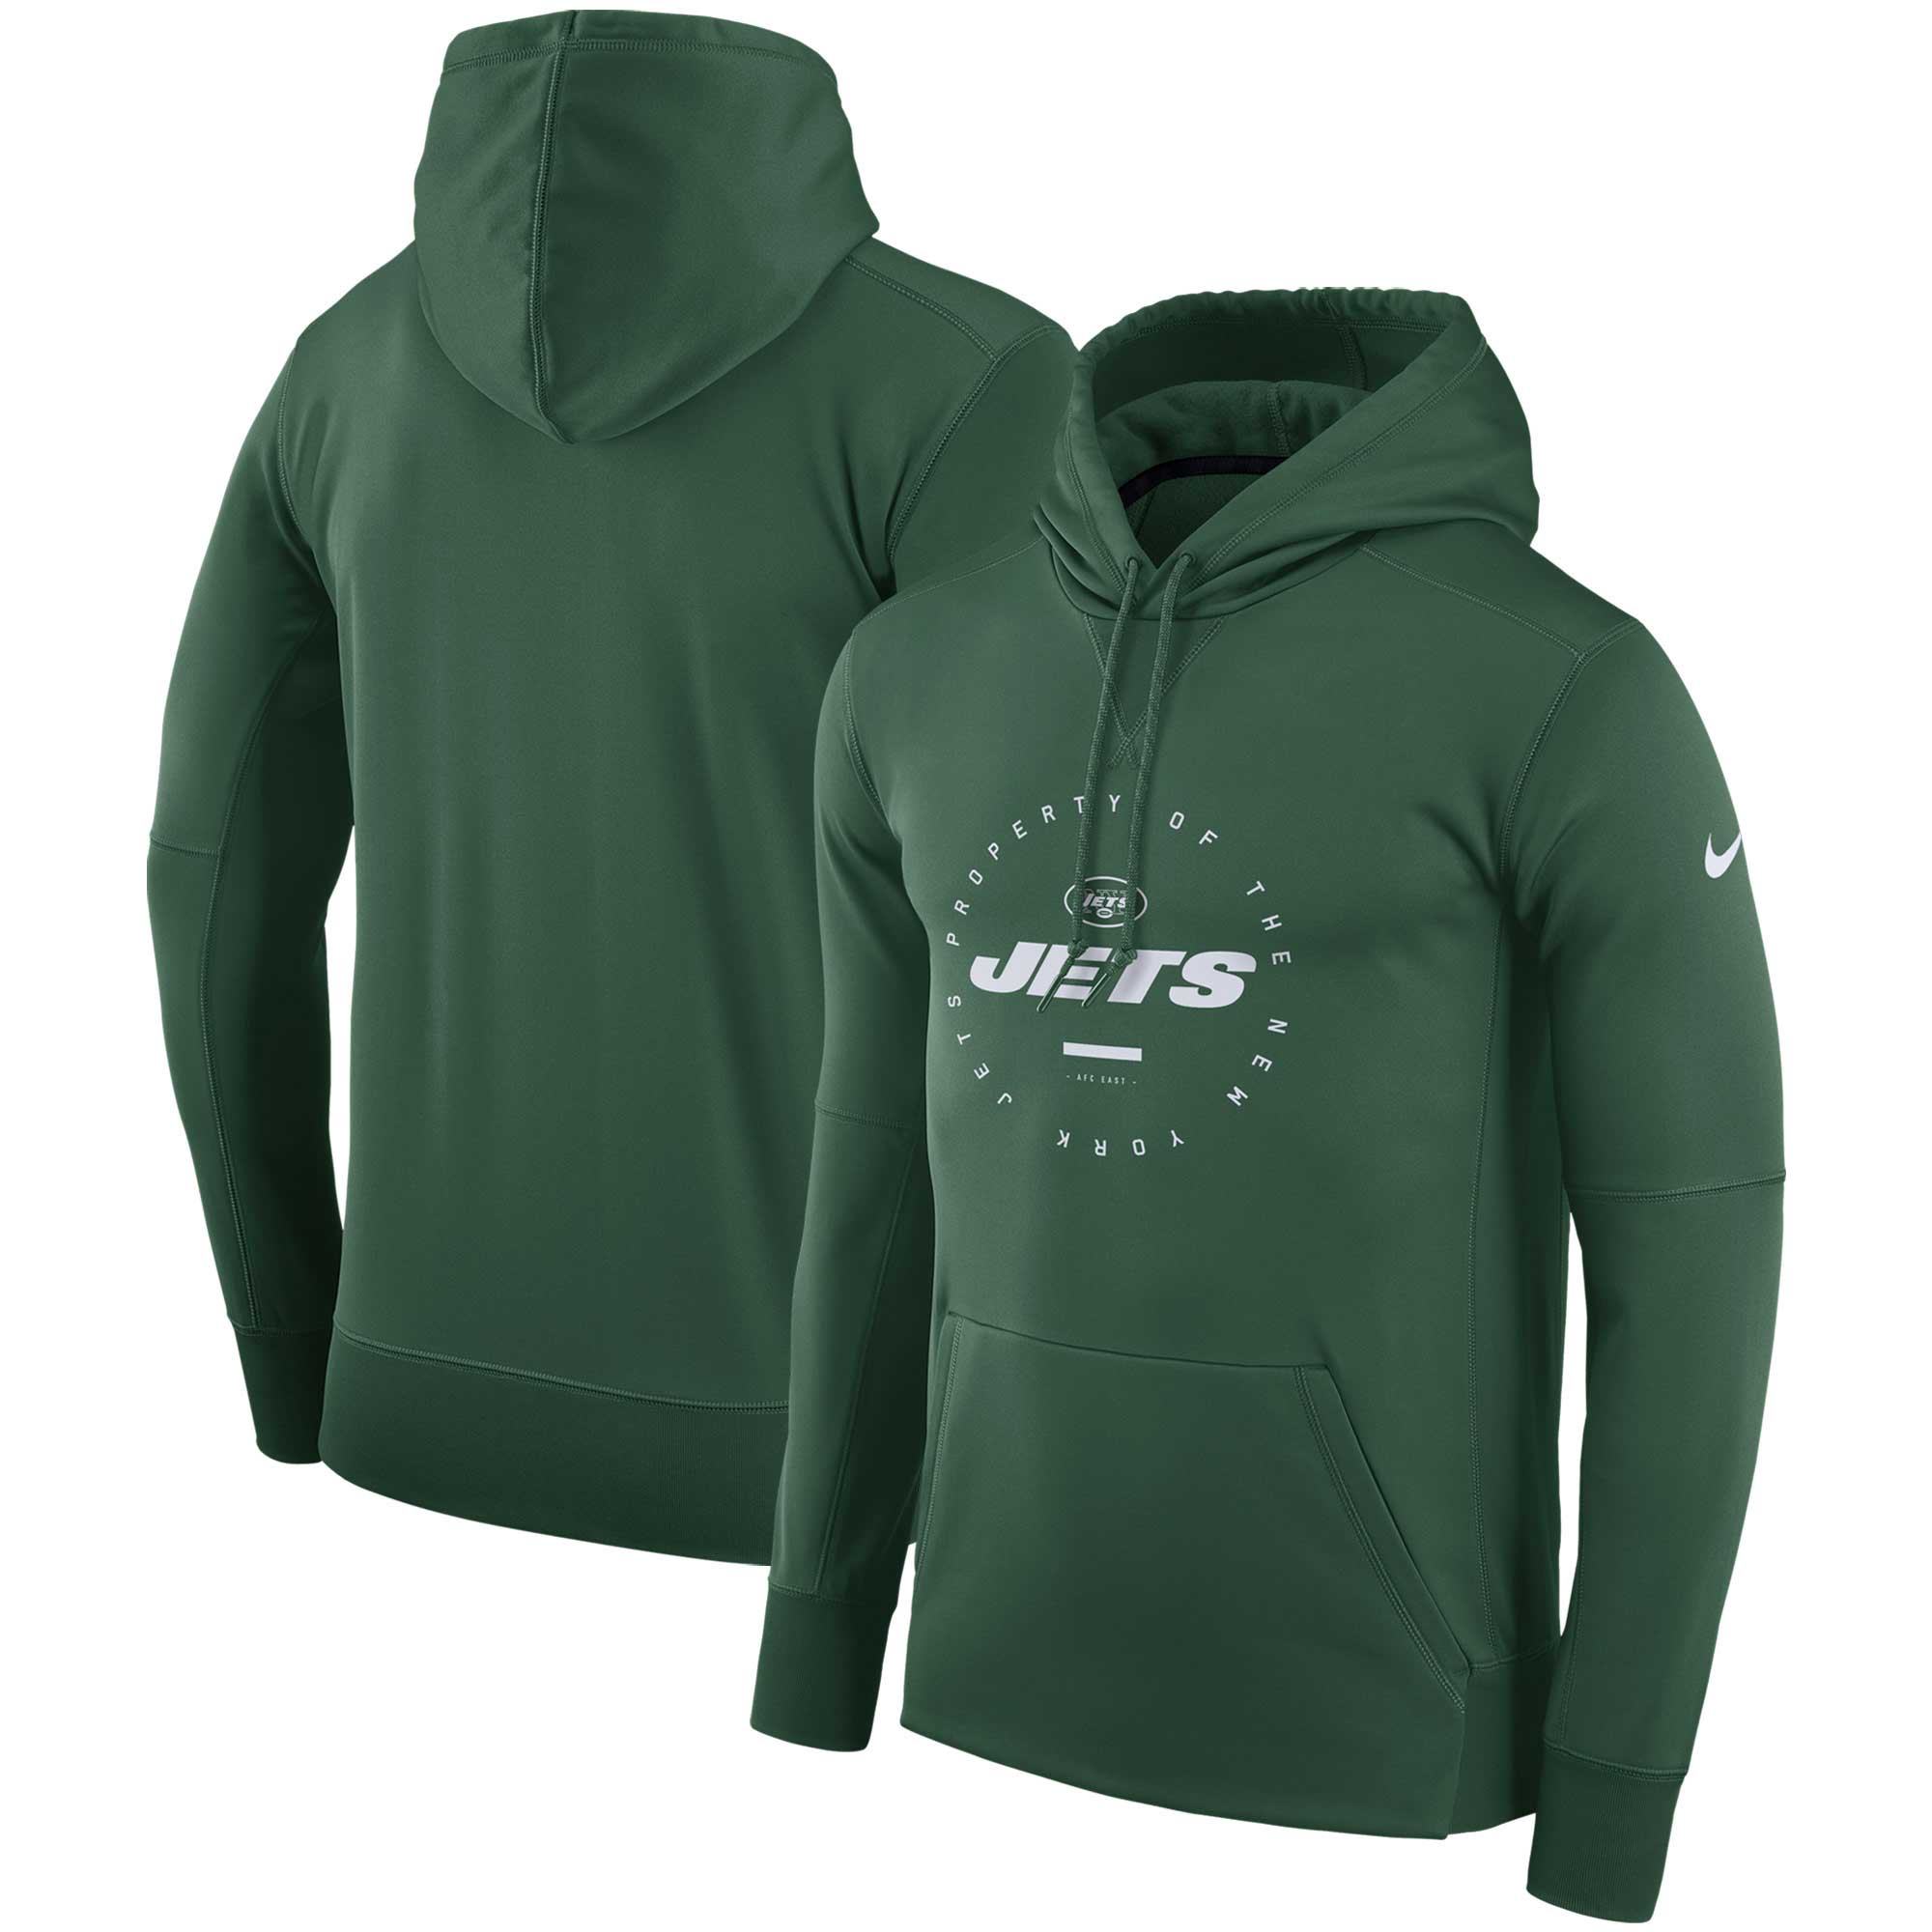 New York Jets Nike Sideline Property Of Wordmark Logo Performance Pullover Hoodie - Green